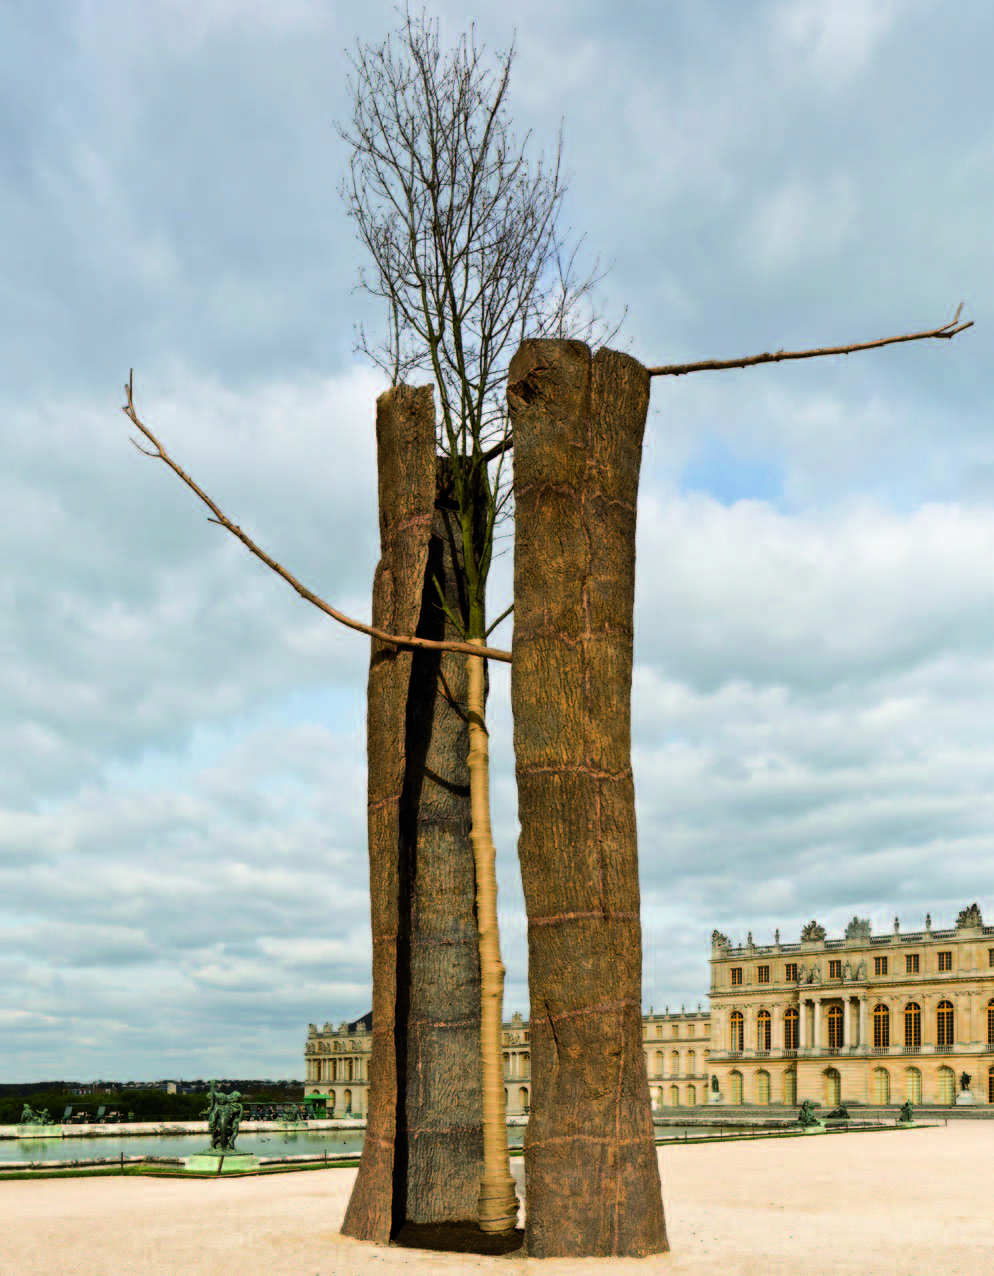 Penone Versailles : Giuseppe Penone. Tra scorza e scorza / Entre écorce et écorce. 2003, bronze et frêne, 950 x 430 x 280 cm. ©  Courtesy Giuseppe Penone - photo tadzio